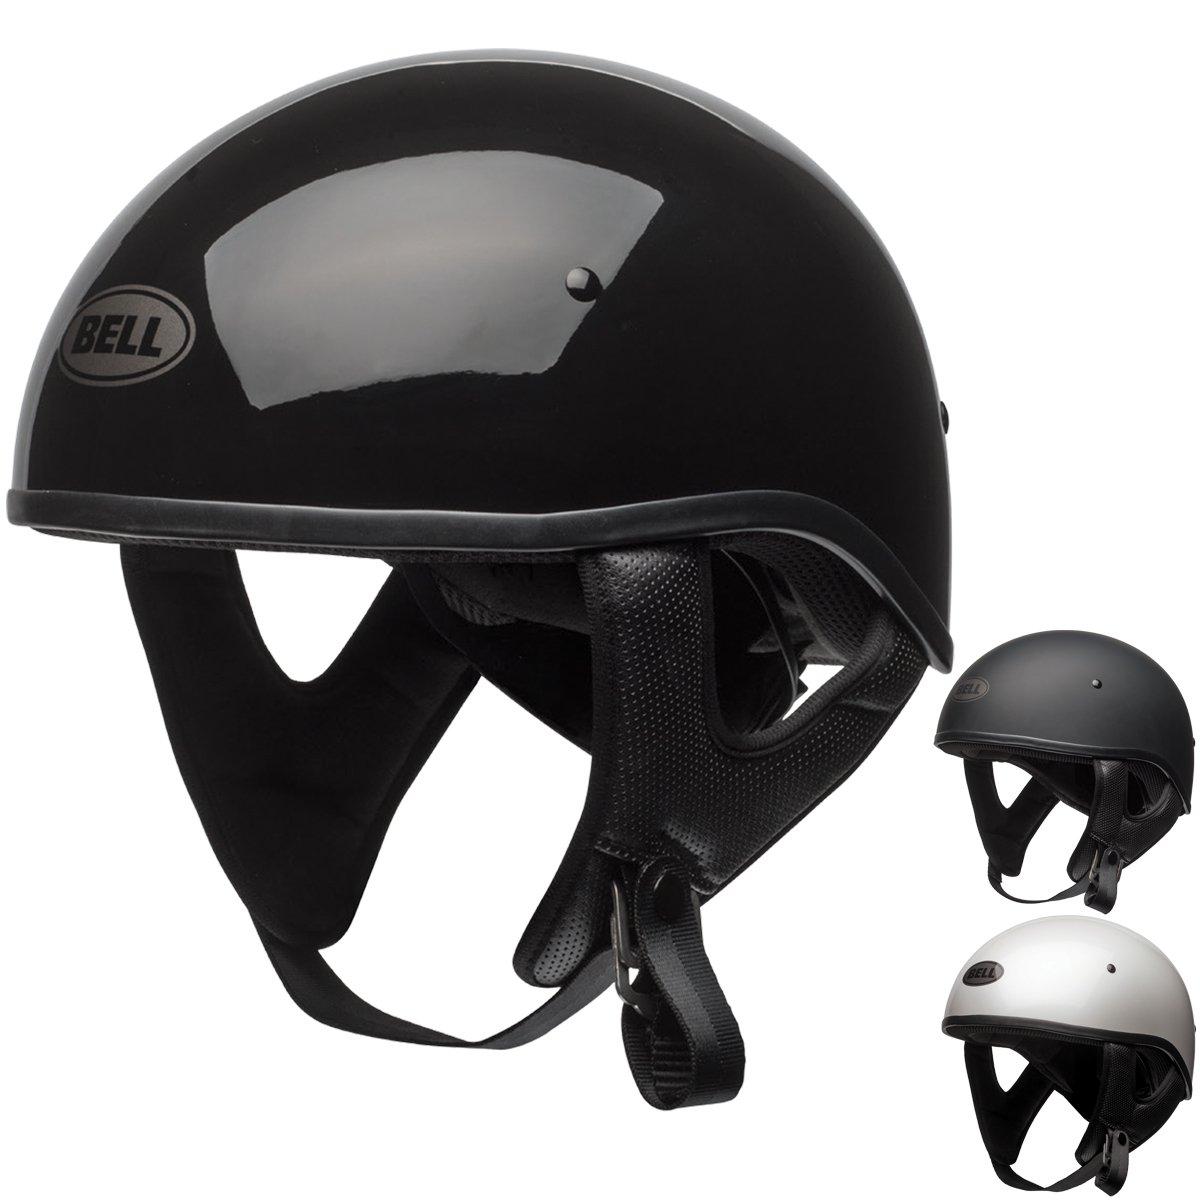 Bell Pit Boss Sport Unisex-Adult Half Street Helmet (Solid Matte Black, X-Small/Small) (D.O.T.-Certified)